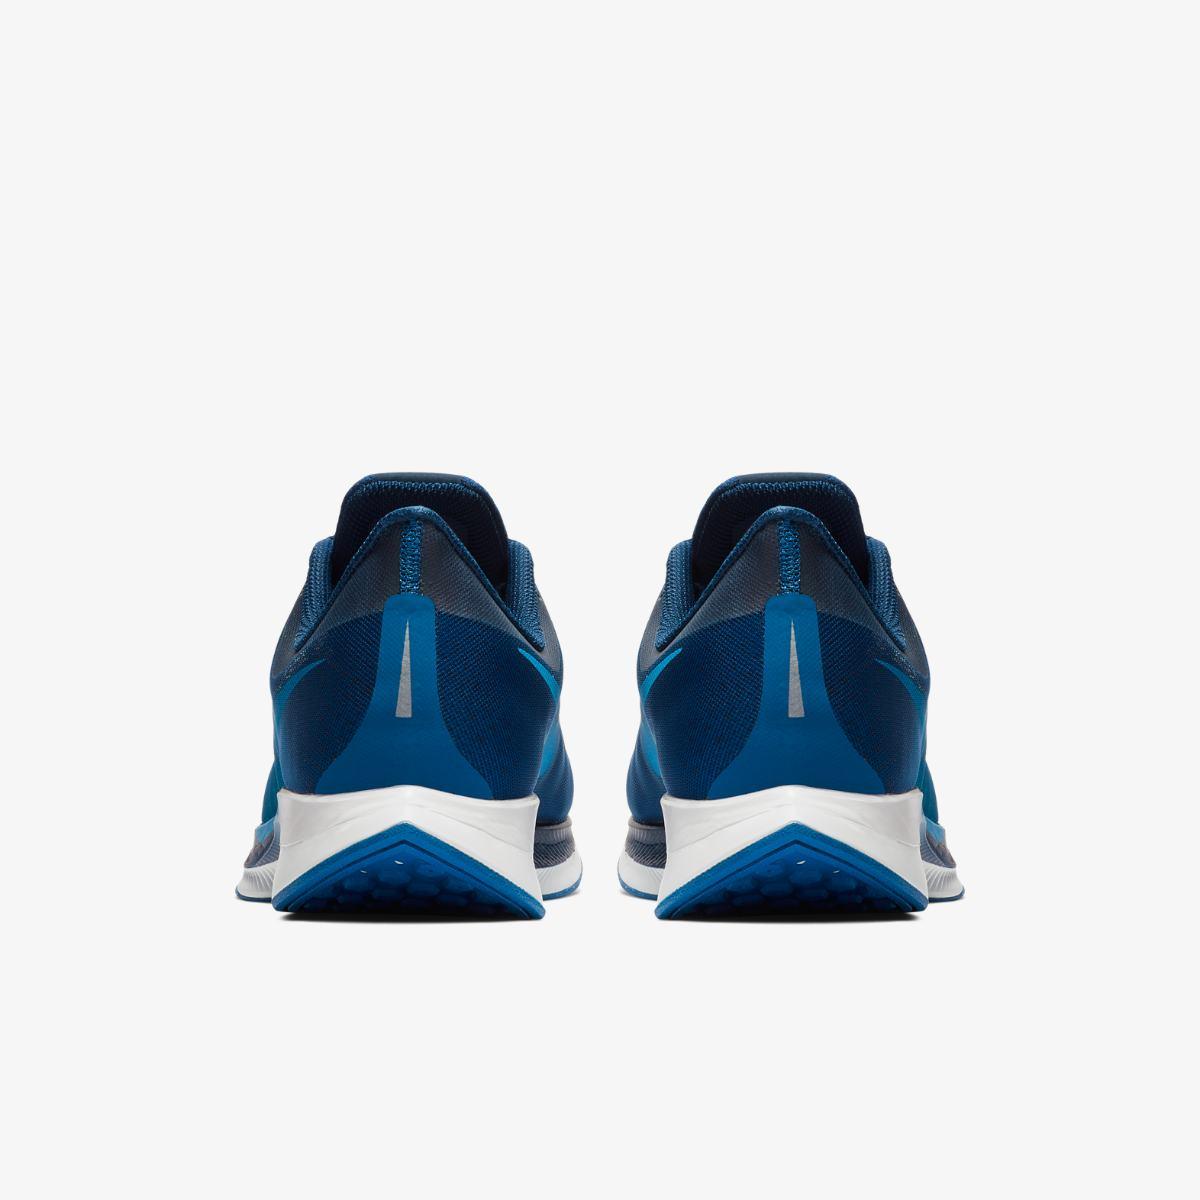 46ec08f6 Кроссовки для бега Nike ZOOM PEGASUS 35 TURBO